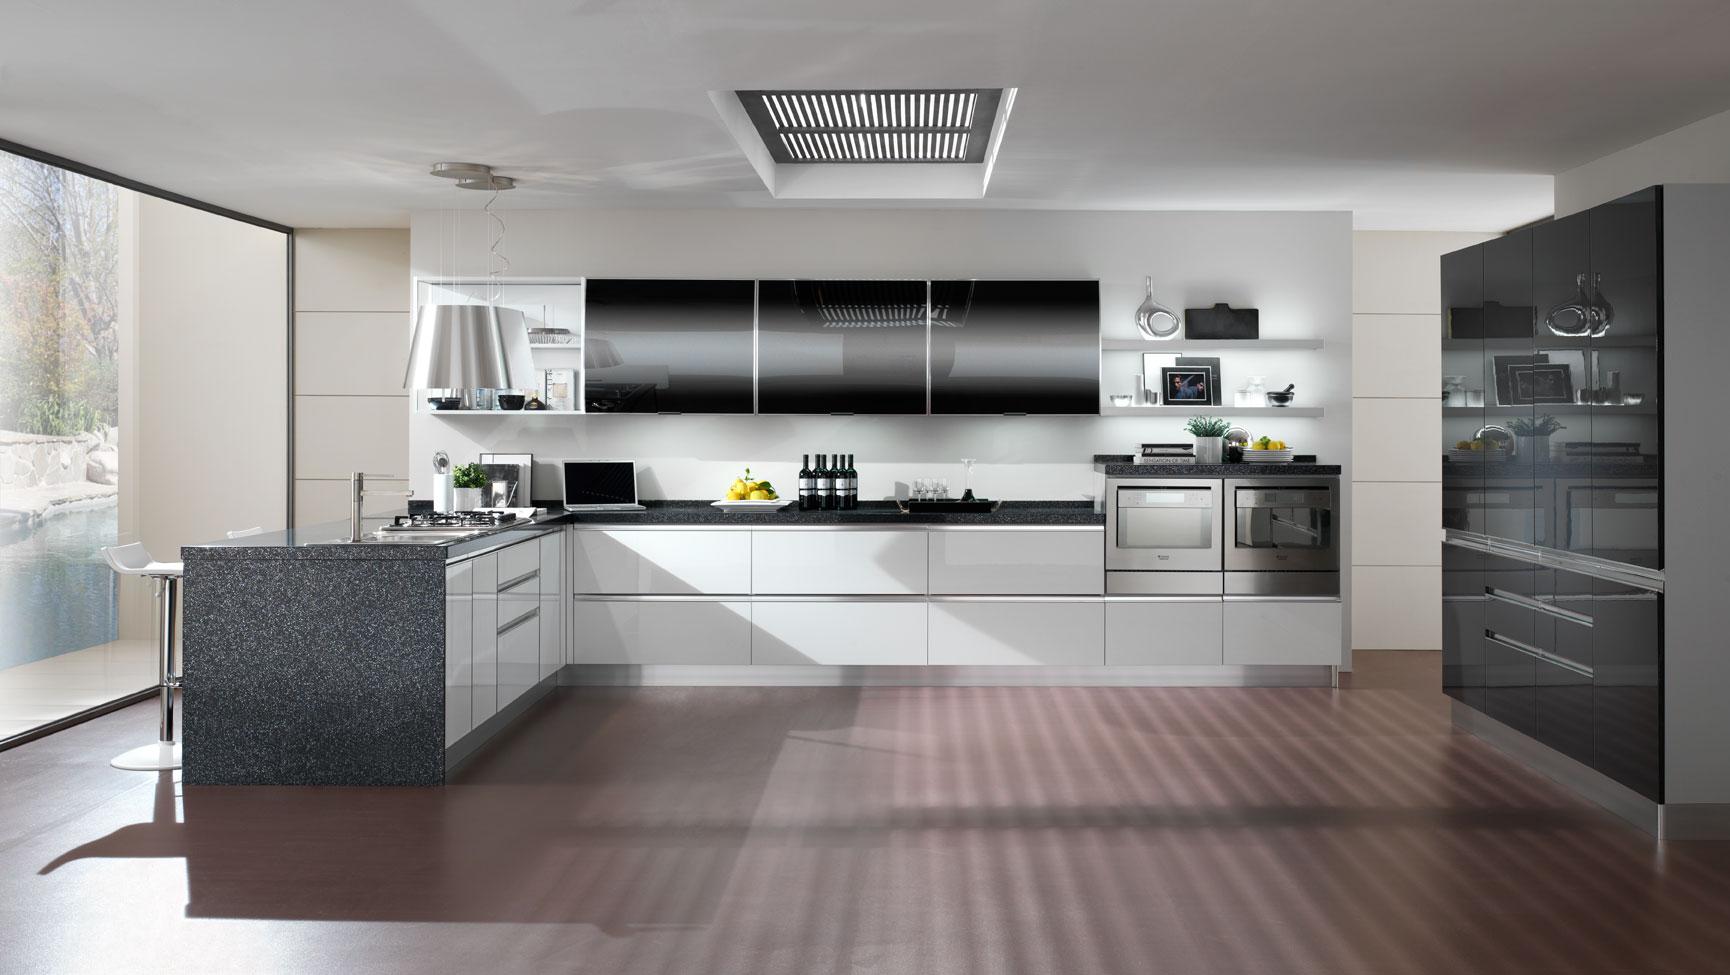 Cucina moderna anta gola arredook ardea arredamento casa cucine camere letti divani - Immagini cucine moderne ...